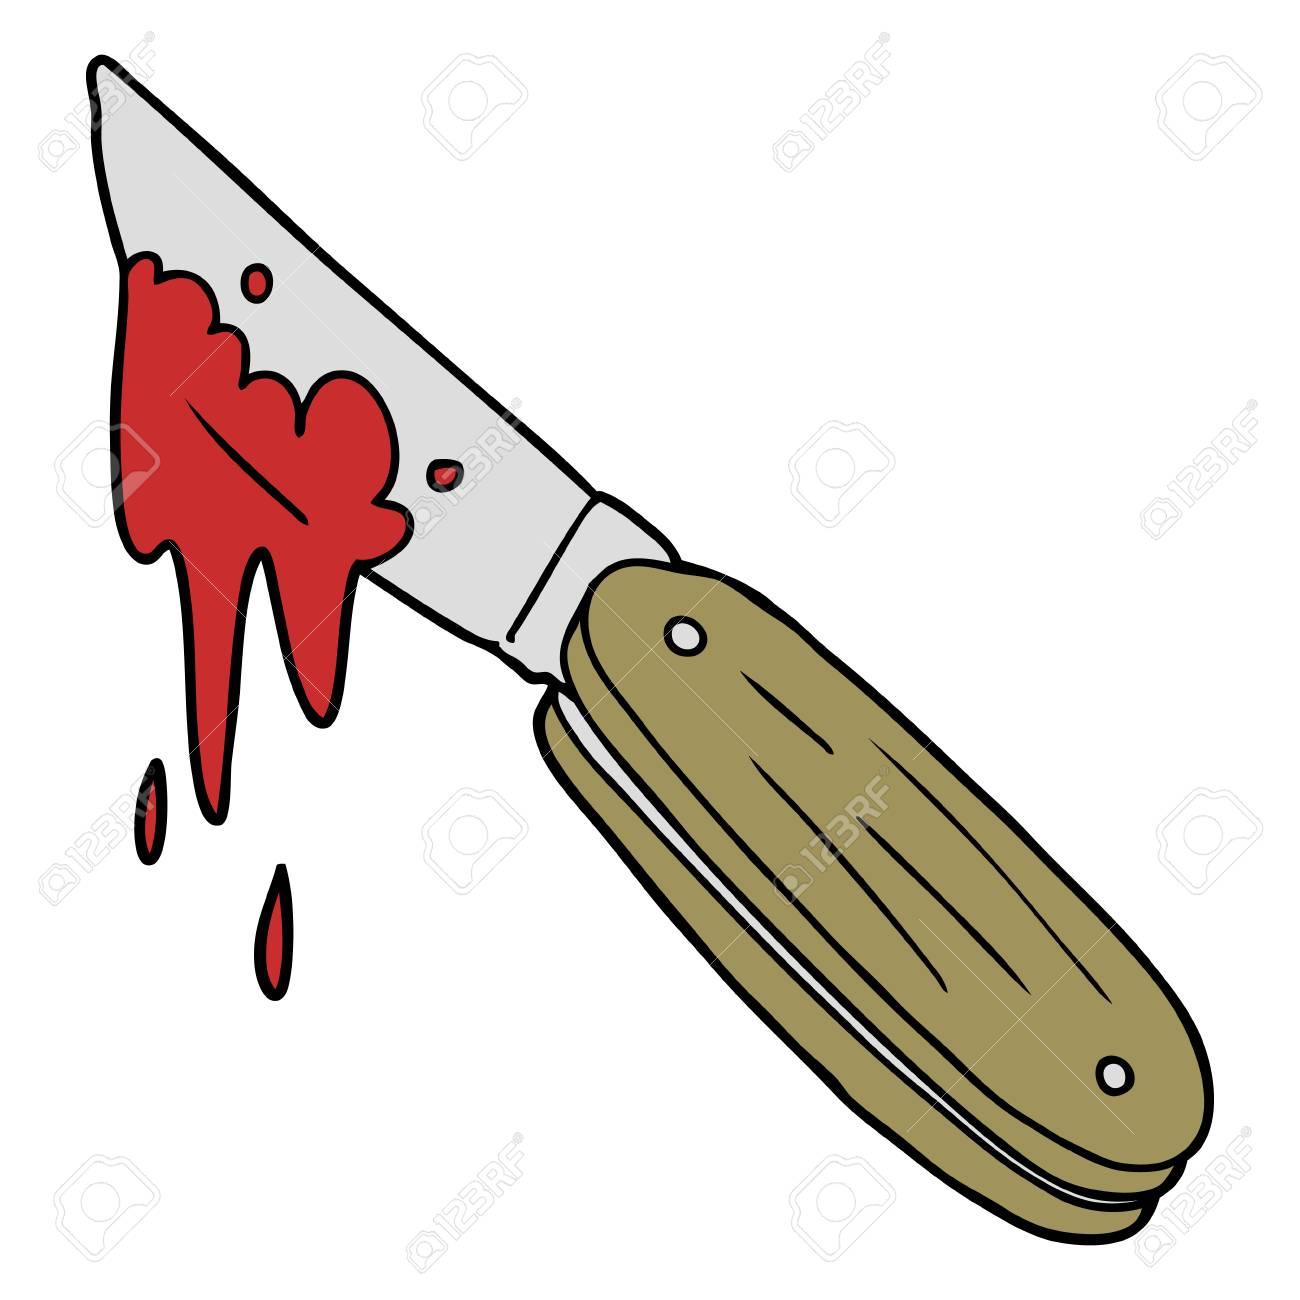 cartoon bloody knife royalty free cliparts vectors and stock rh 123rf com